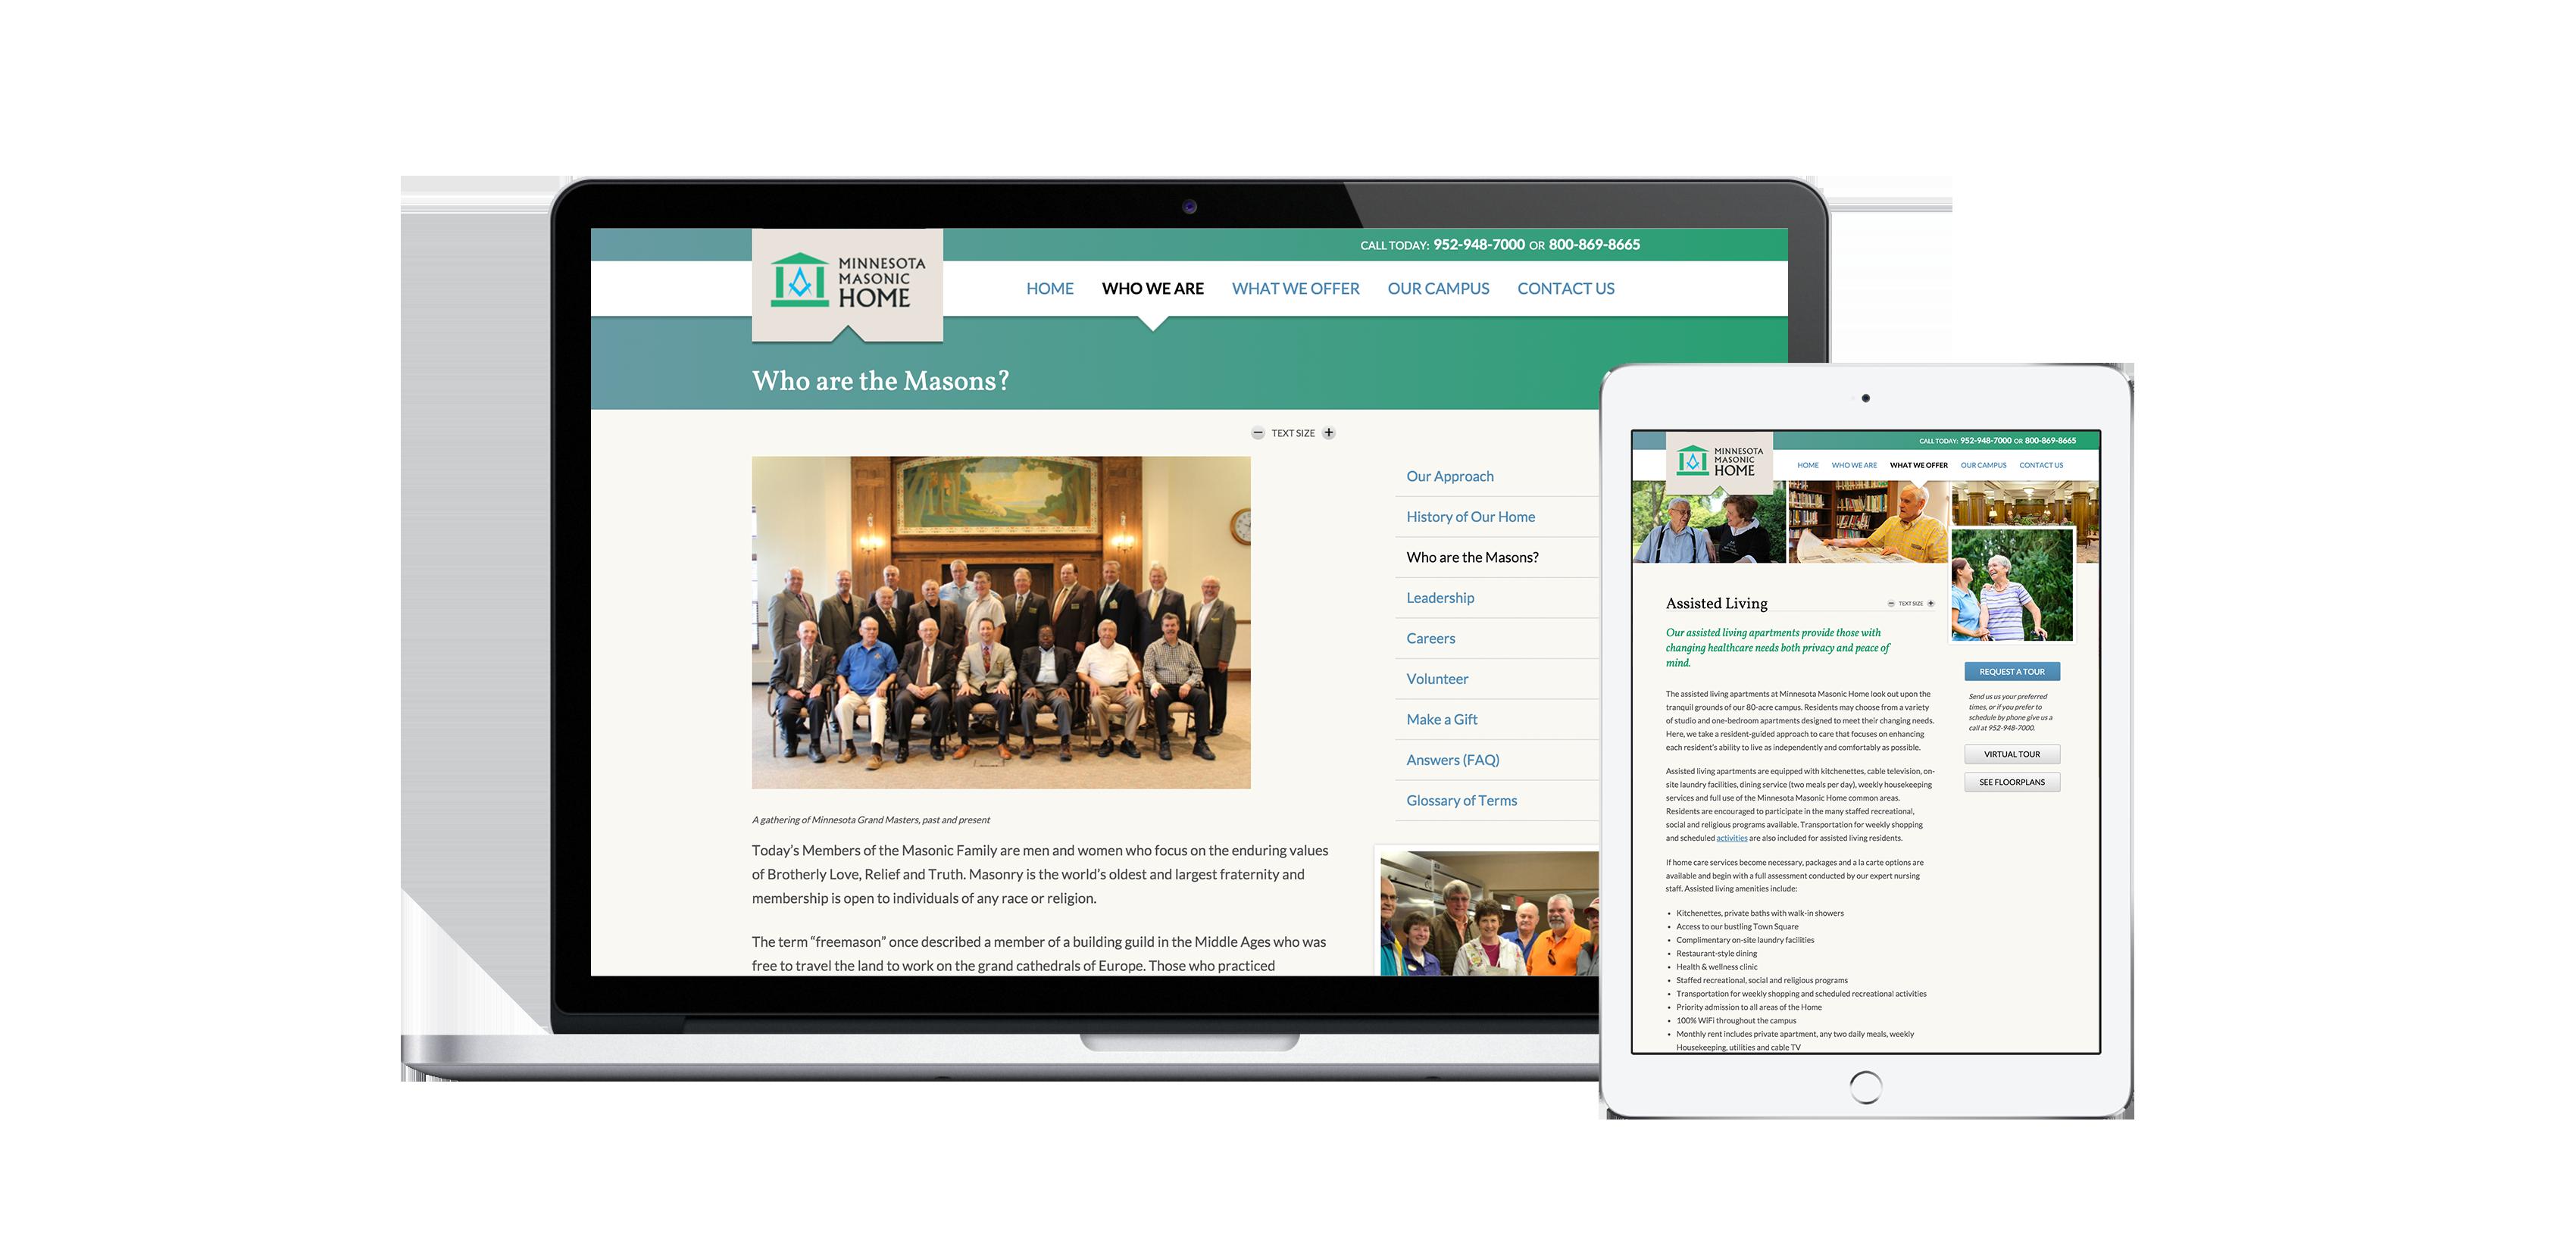 Minnesota Masonic Home Website on Macbook and iPad